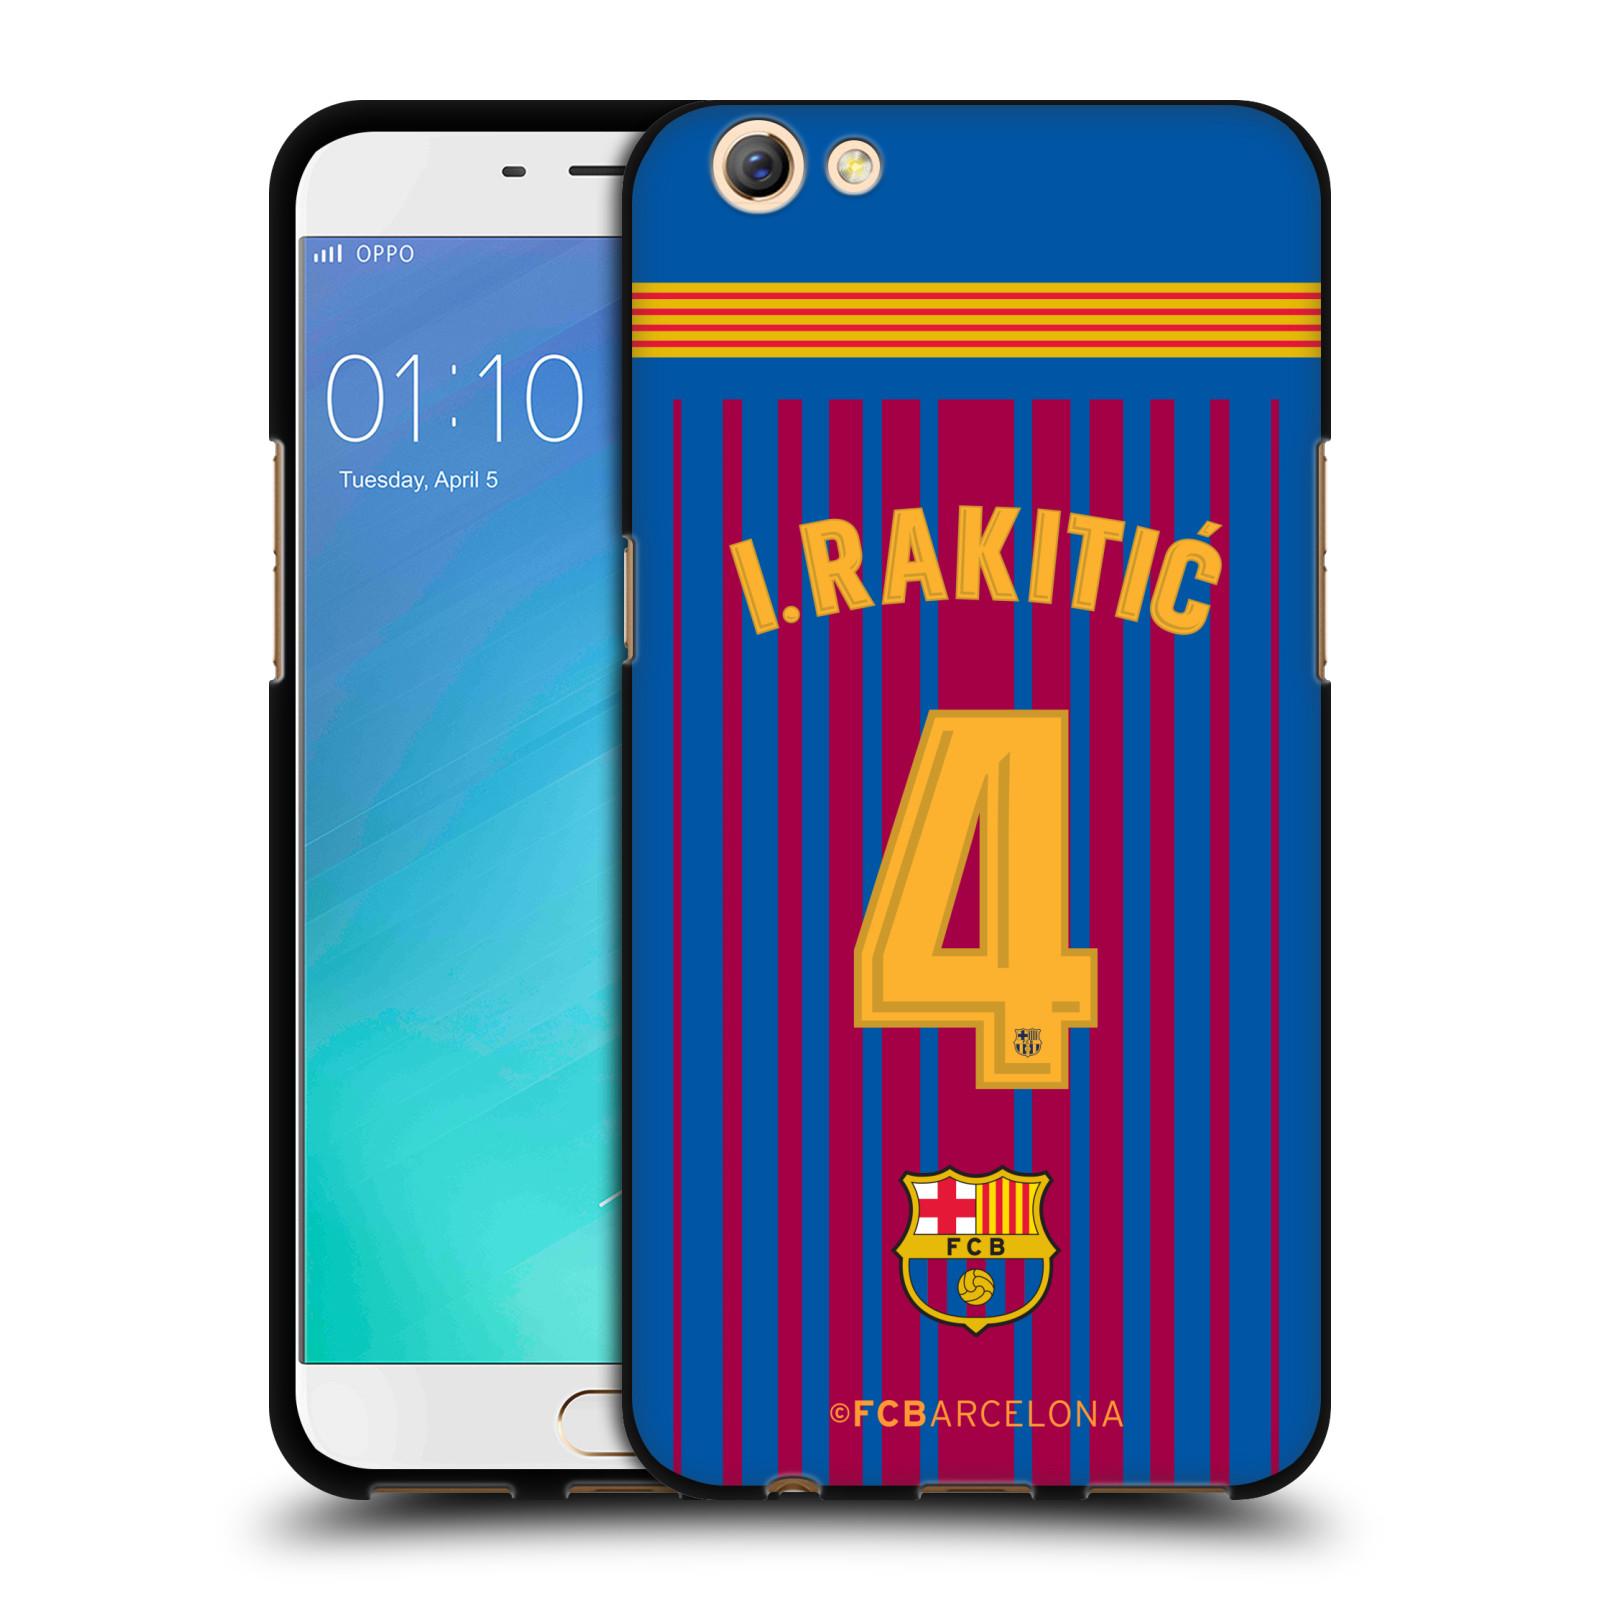 OFFICIAL-FC-BARCELONA-2017-18-PLAYERS-HOME-KIT-1-BLACK-GEL-CASE-FOR-OPPO-PHONES